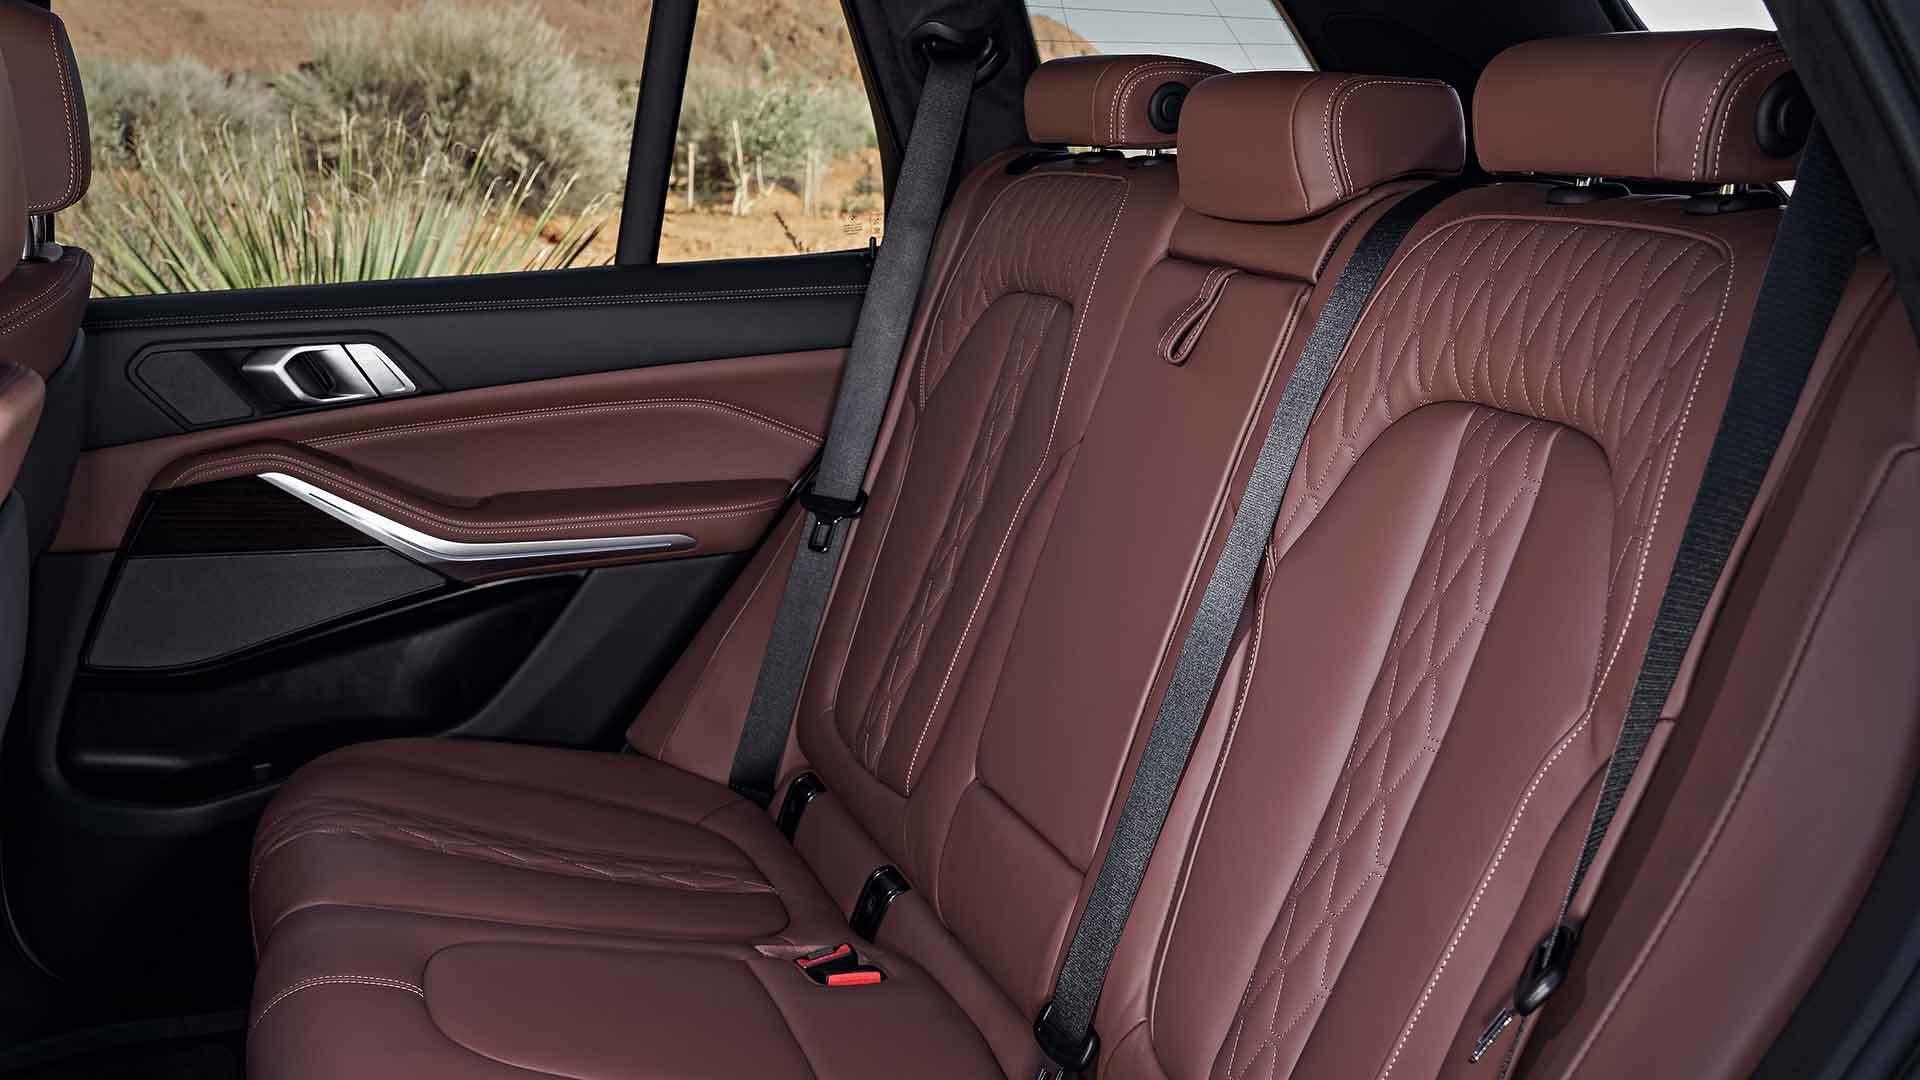 BMW-X5-G05-2019-11.jpg